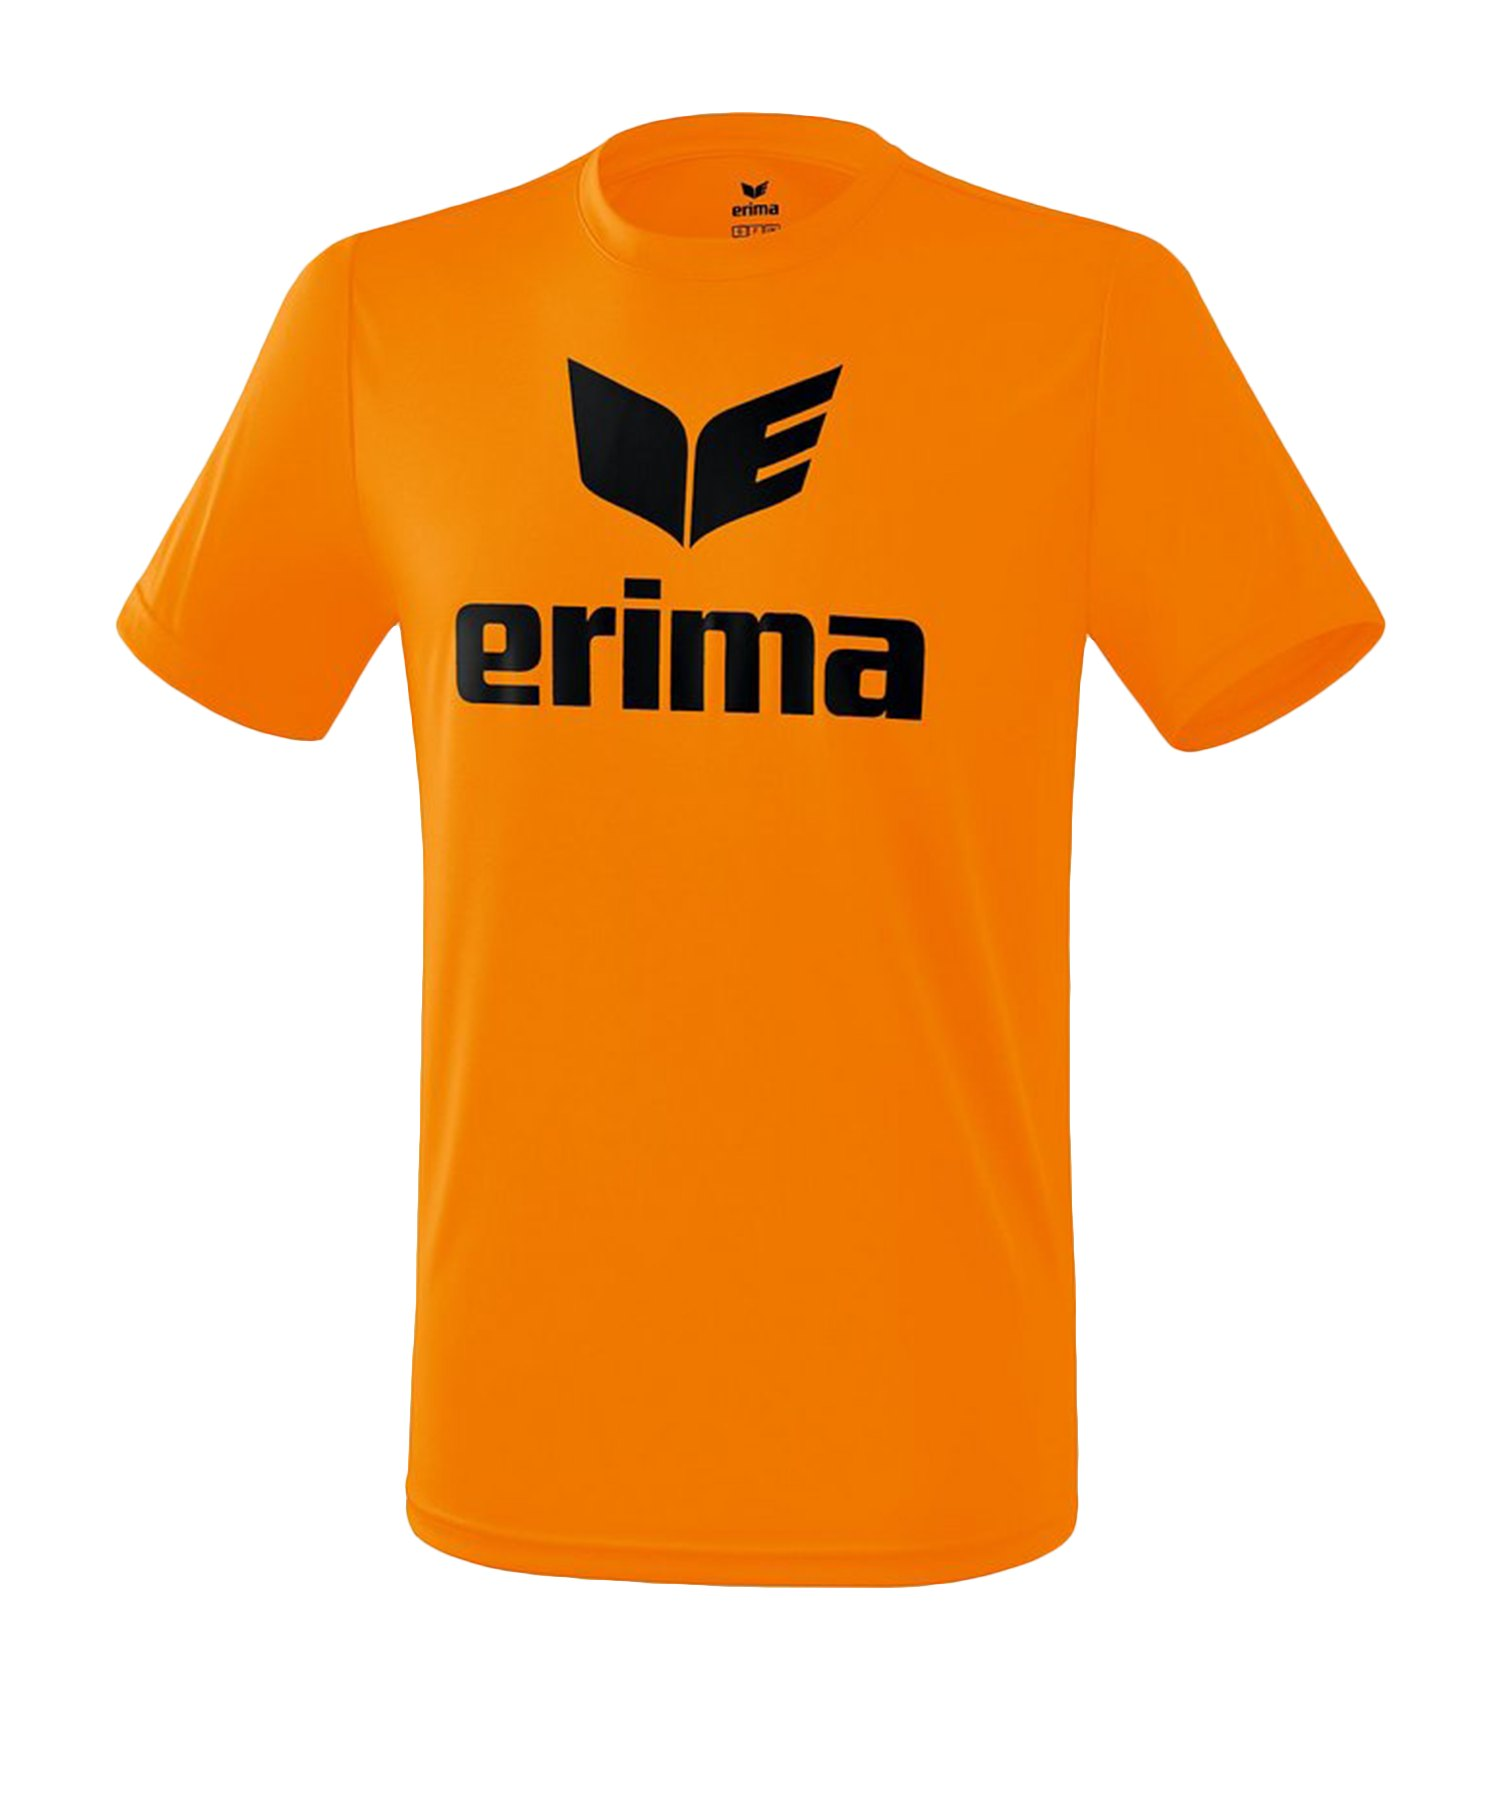 Erima Funktions Promo T-Shirt Kids Orange Schwarz - Orange